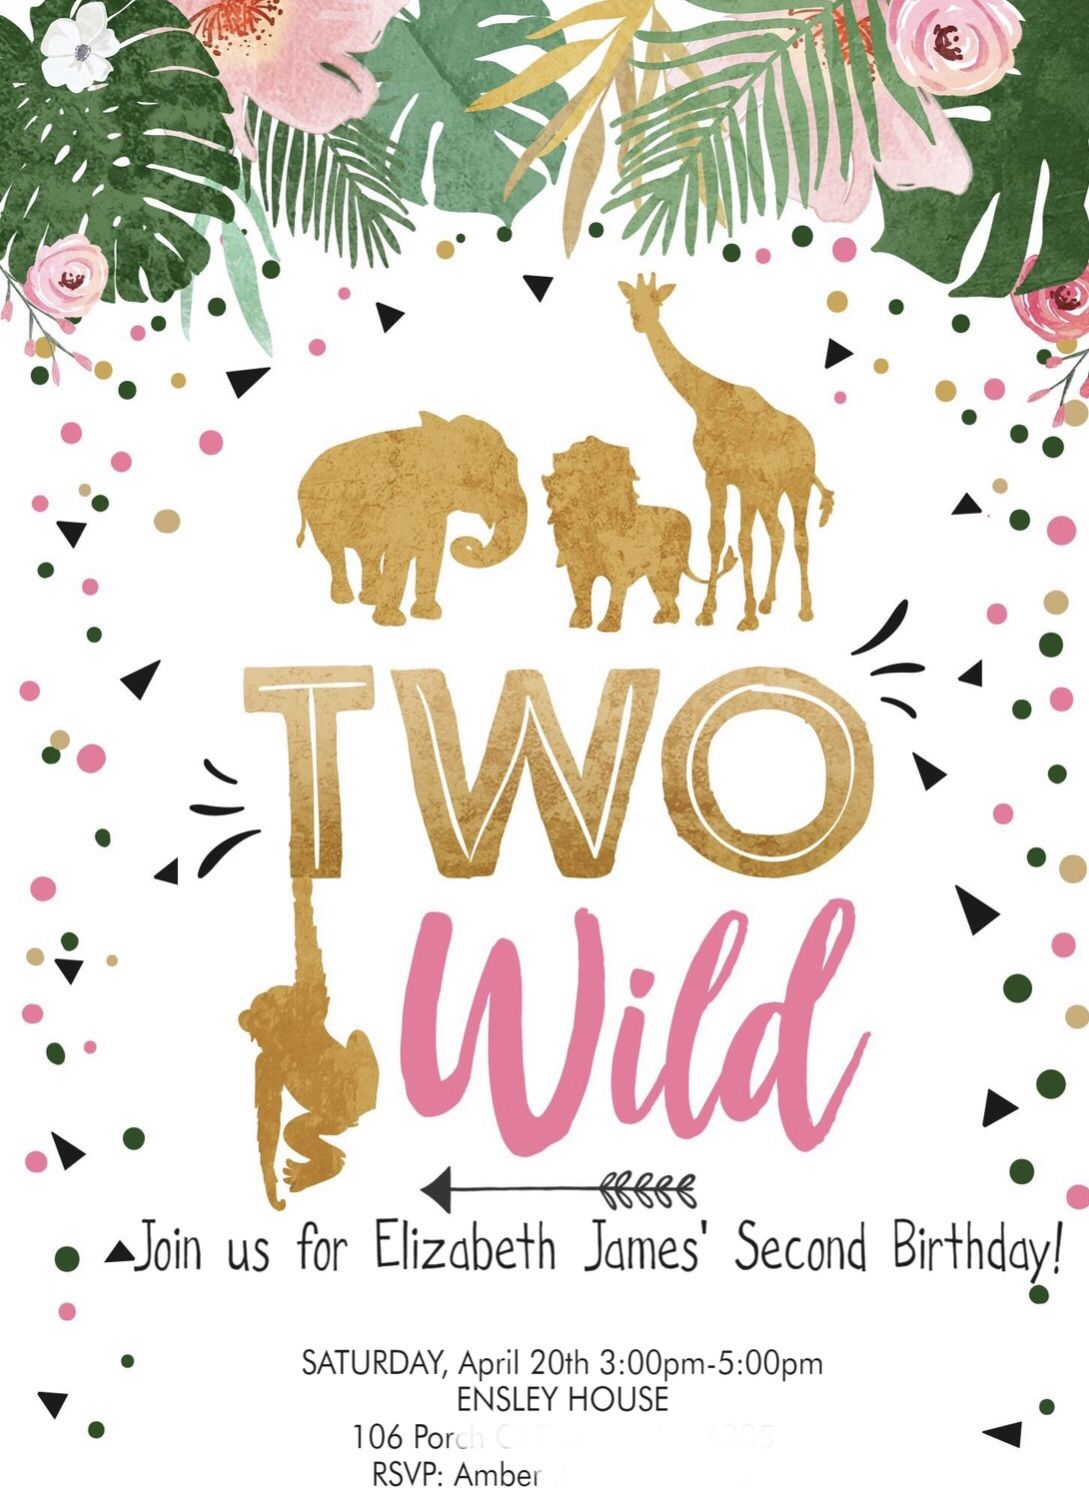 2 Wild Birthday Party Invitation Wild birthday party